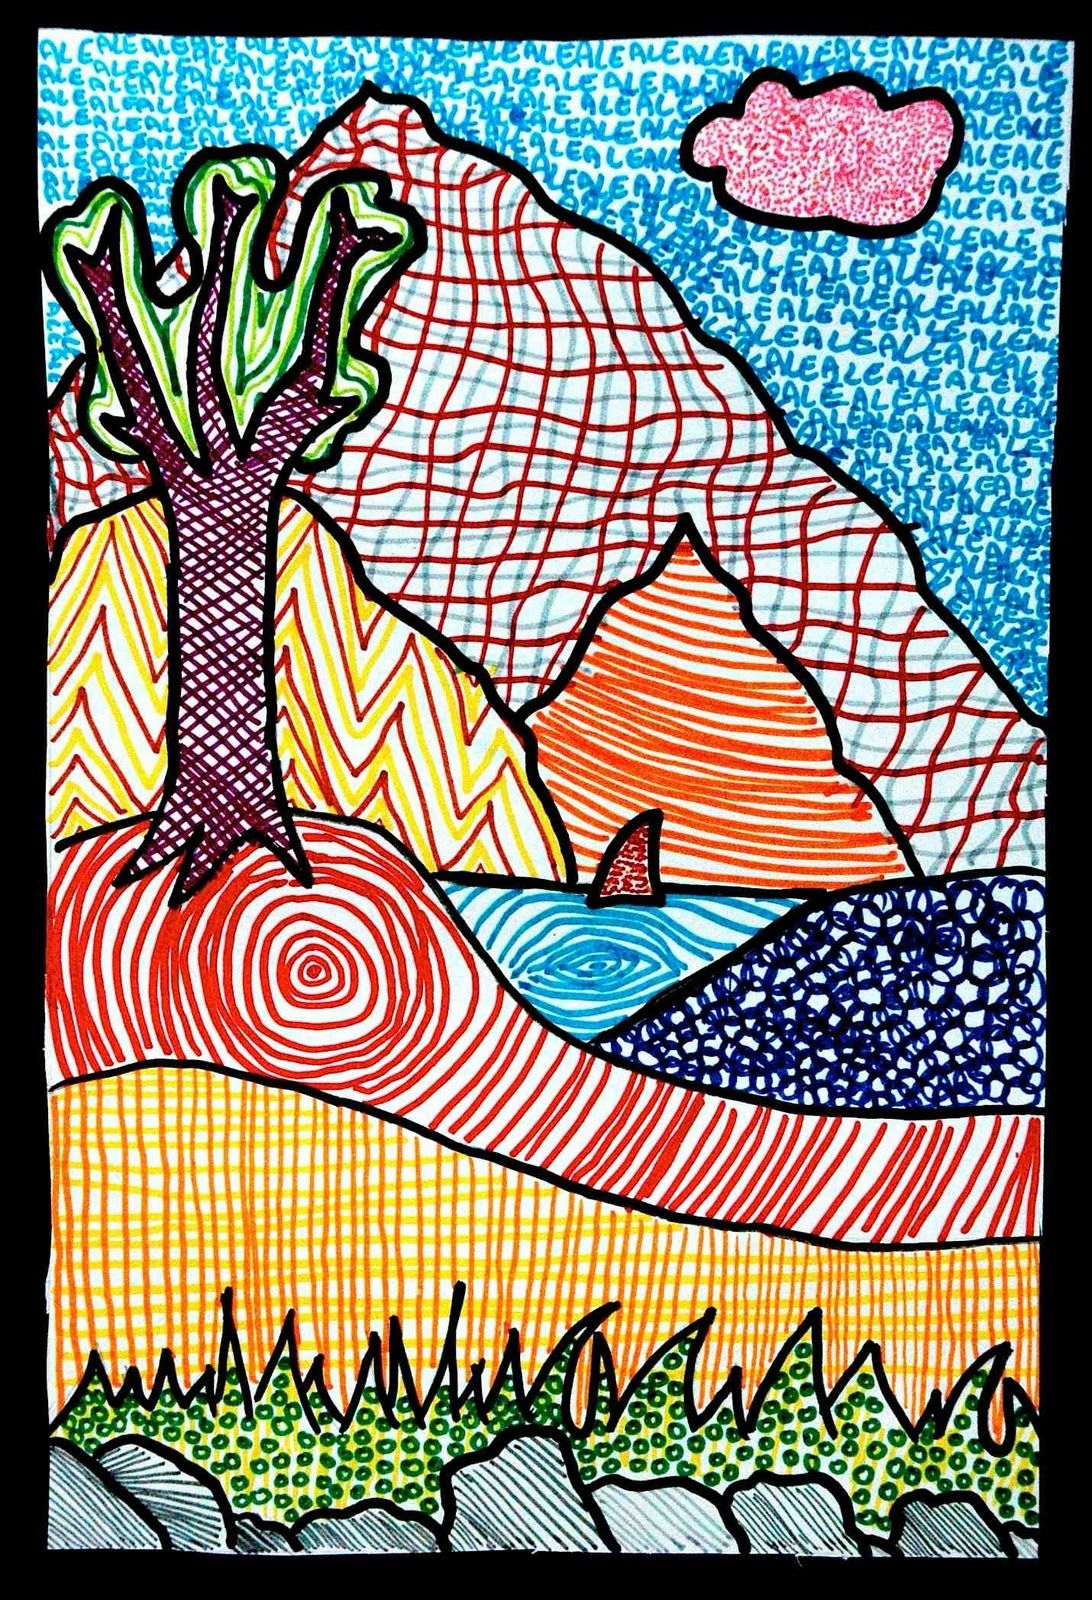 Texture S Landscapes School Art Projects Elementary Art Art